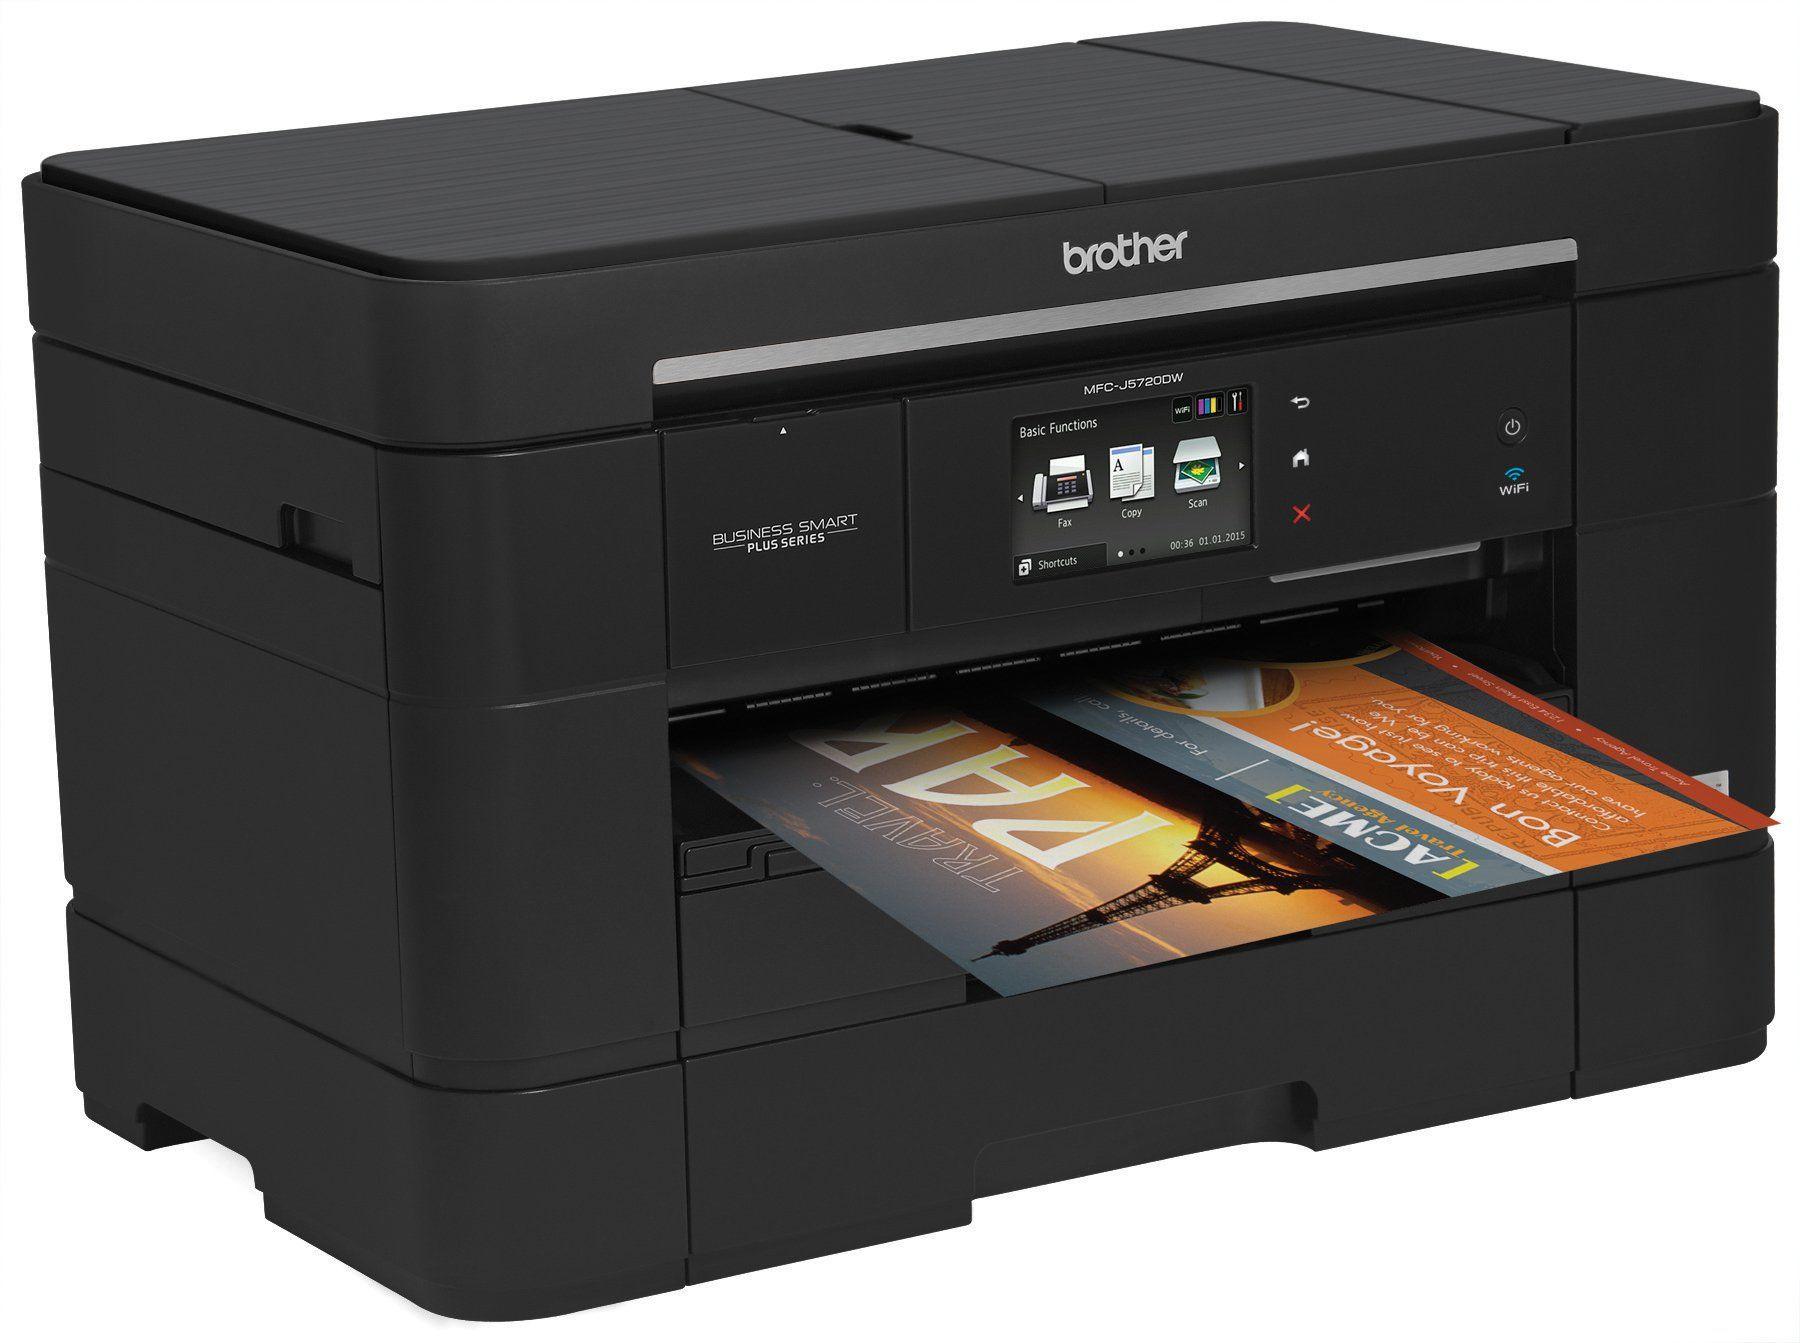 Brother Business Smart MFCJ5720DW AllinOne Color Inkjet